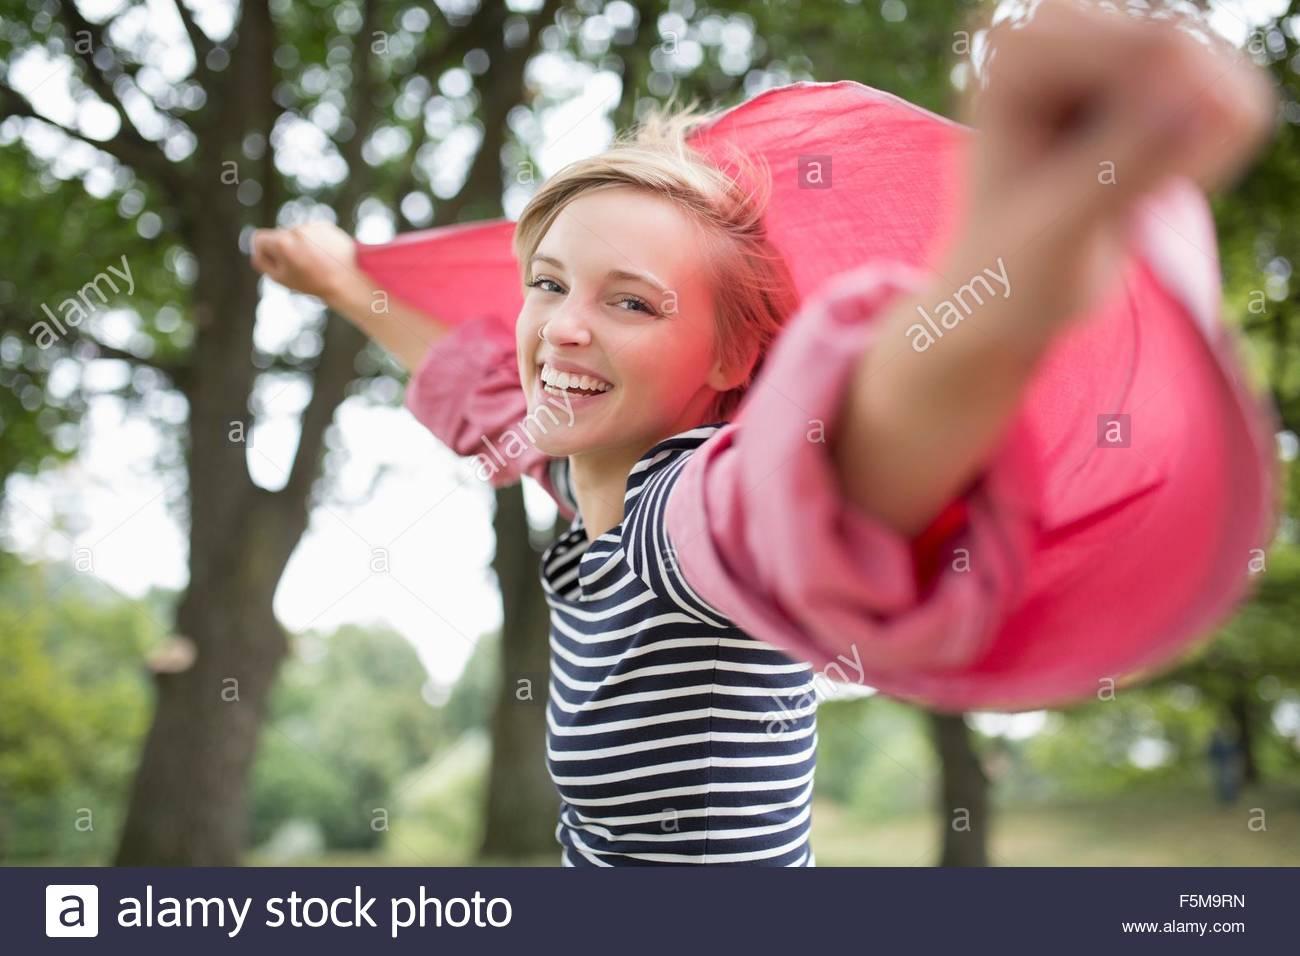 Porträt der jungen Frau mit Waffen offen tragen rosa Hemd Stockbild